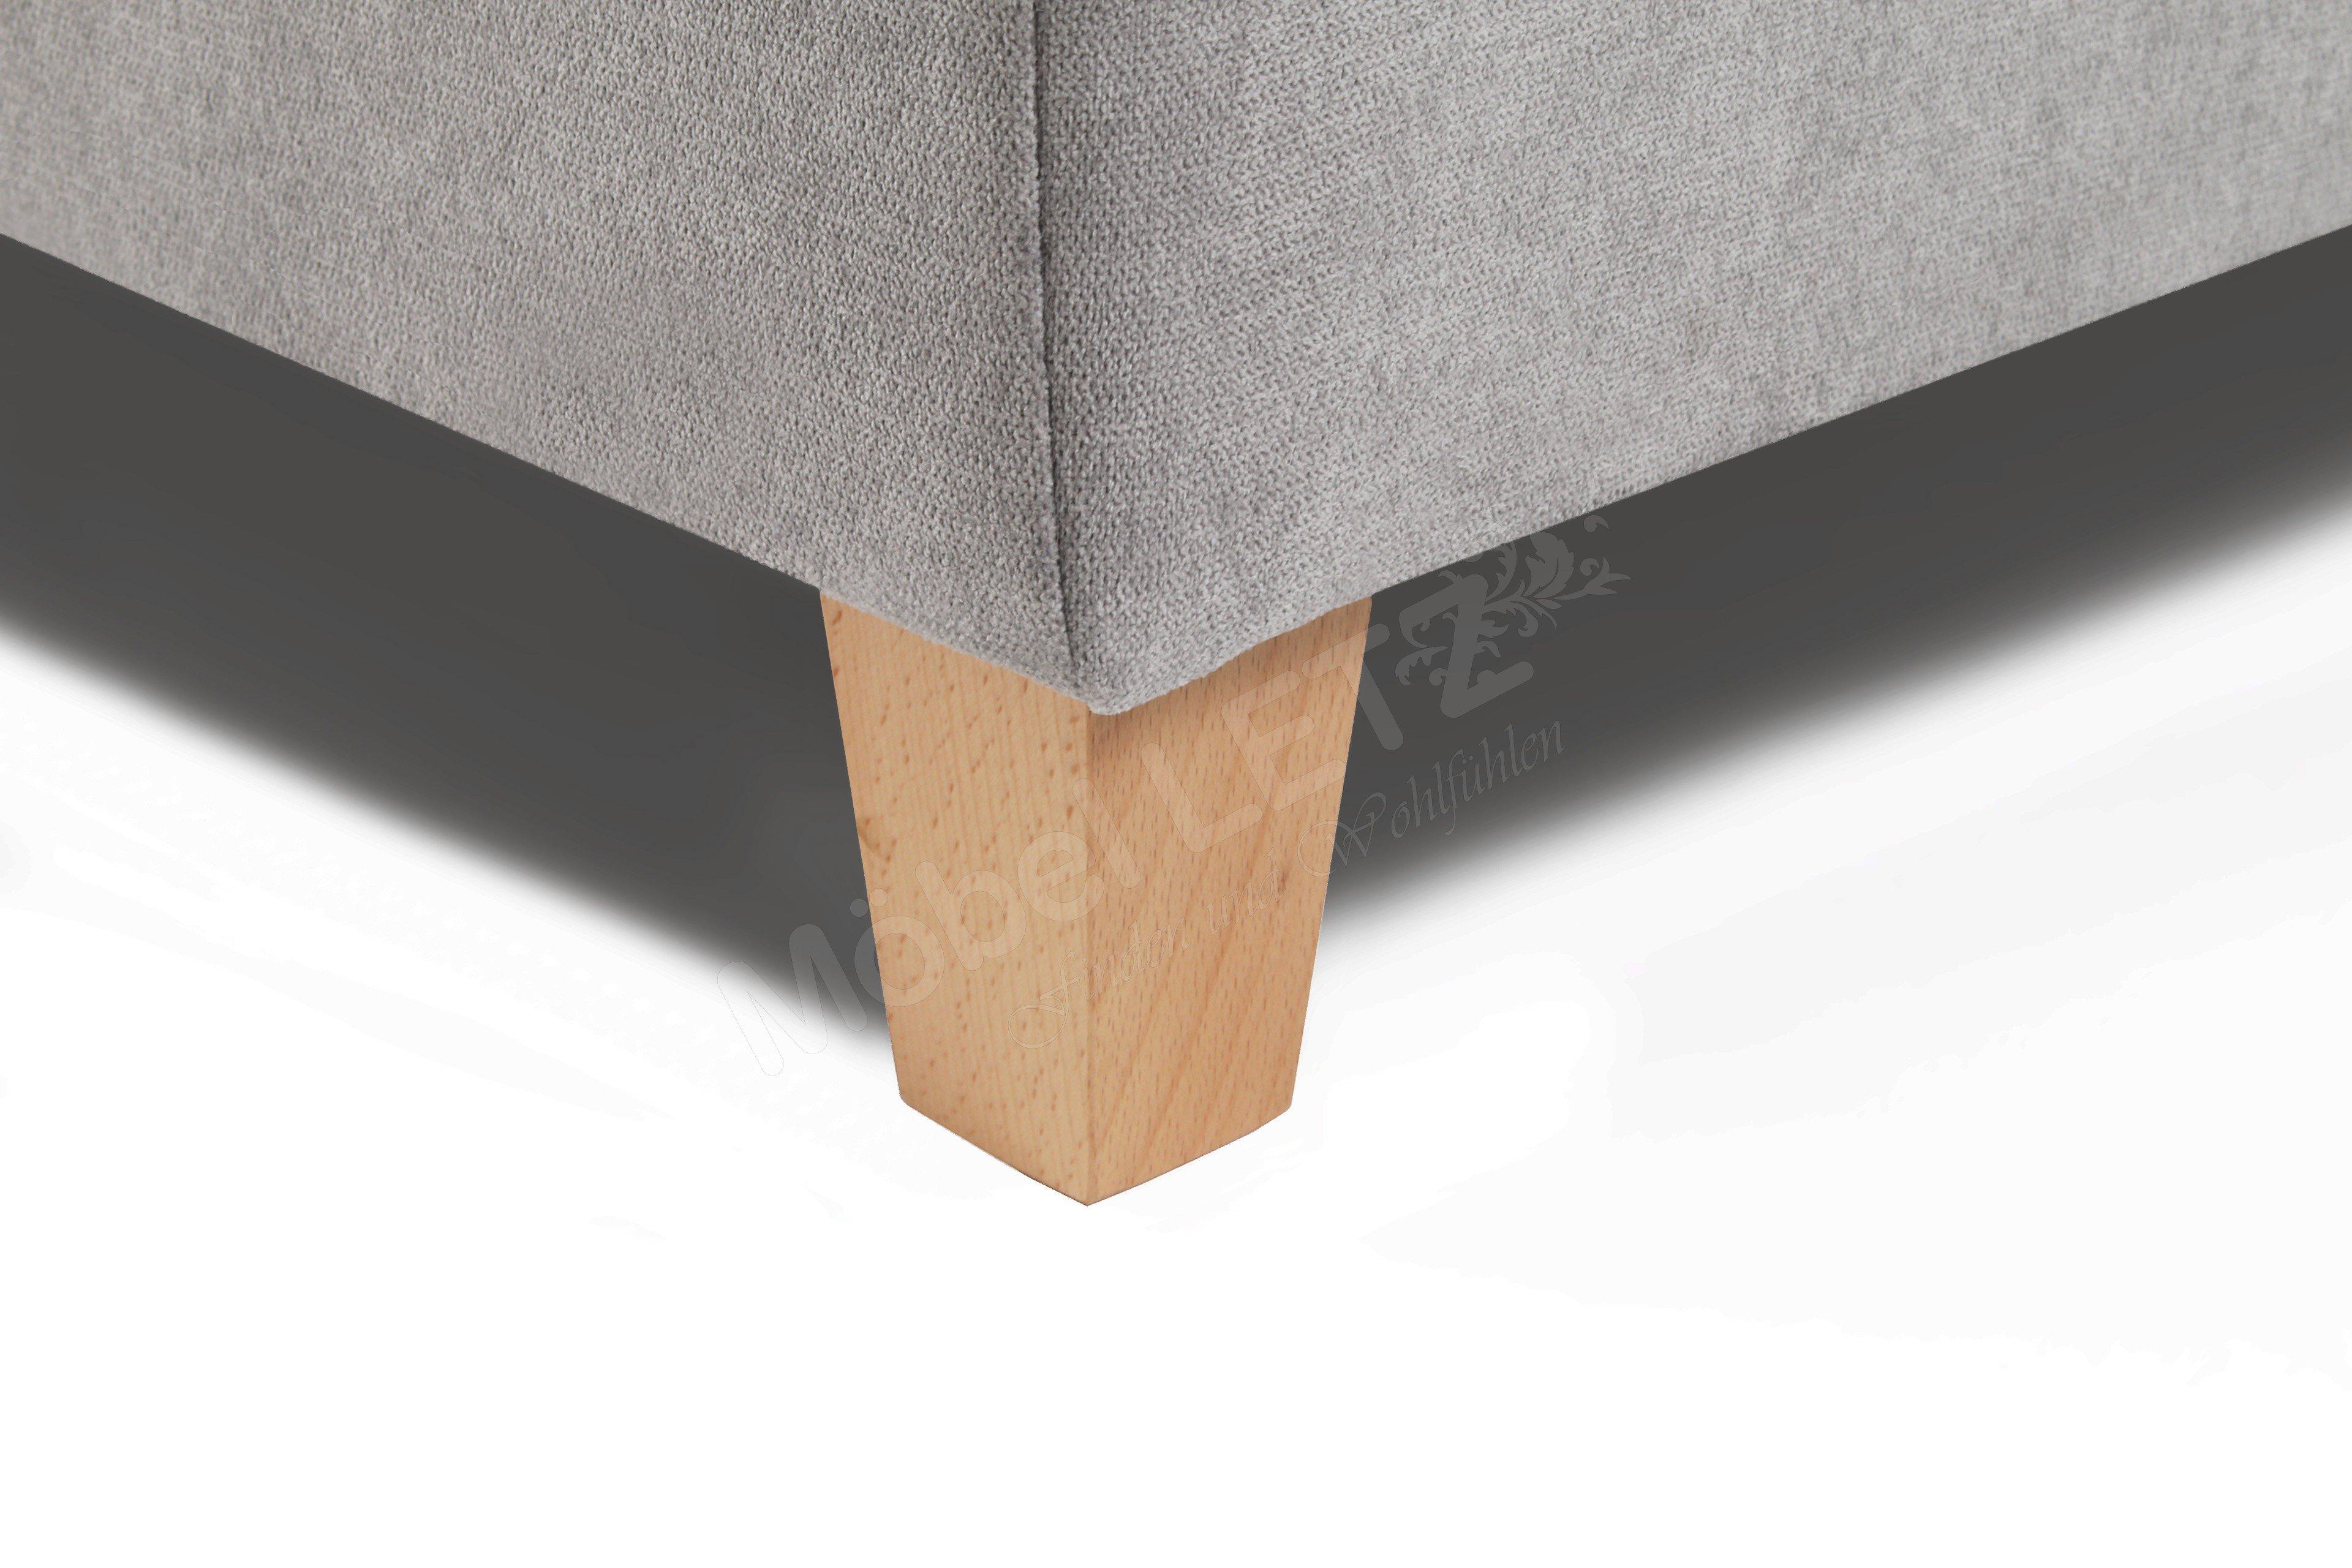 skandinavische m bel boxspringbett janno in hellgrau mit holzf en m bel letz ihr online shop. Black Bedroom Furniture Sets. Home Design Ideas